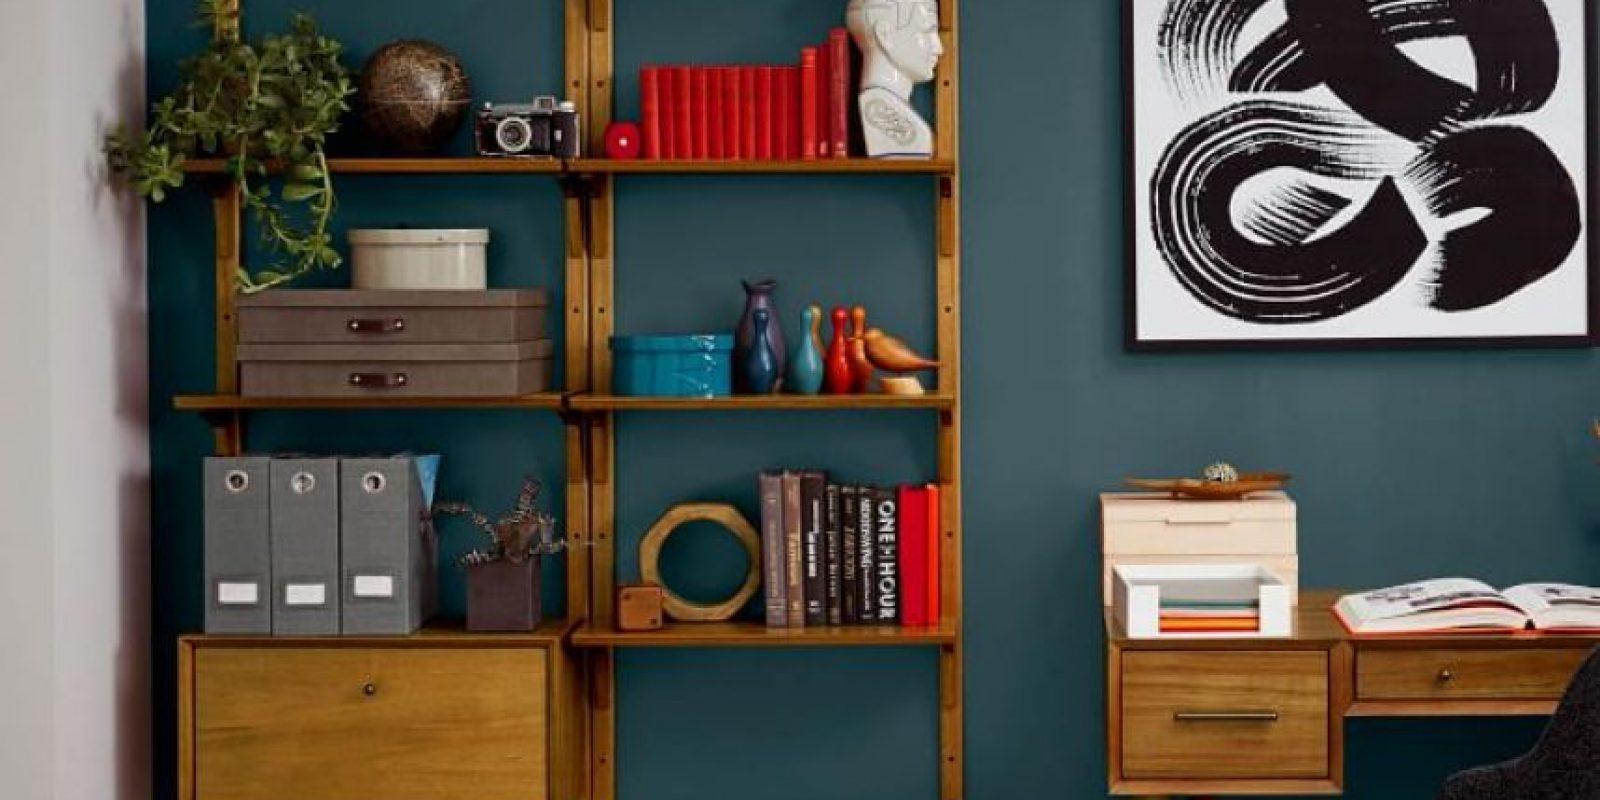 Mid-Century Wall Shelving + Cabinet Set Foto:West Elm. Imagen Por: